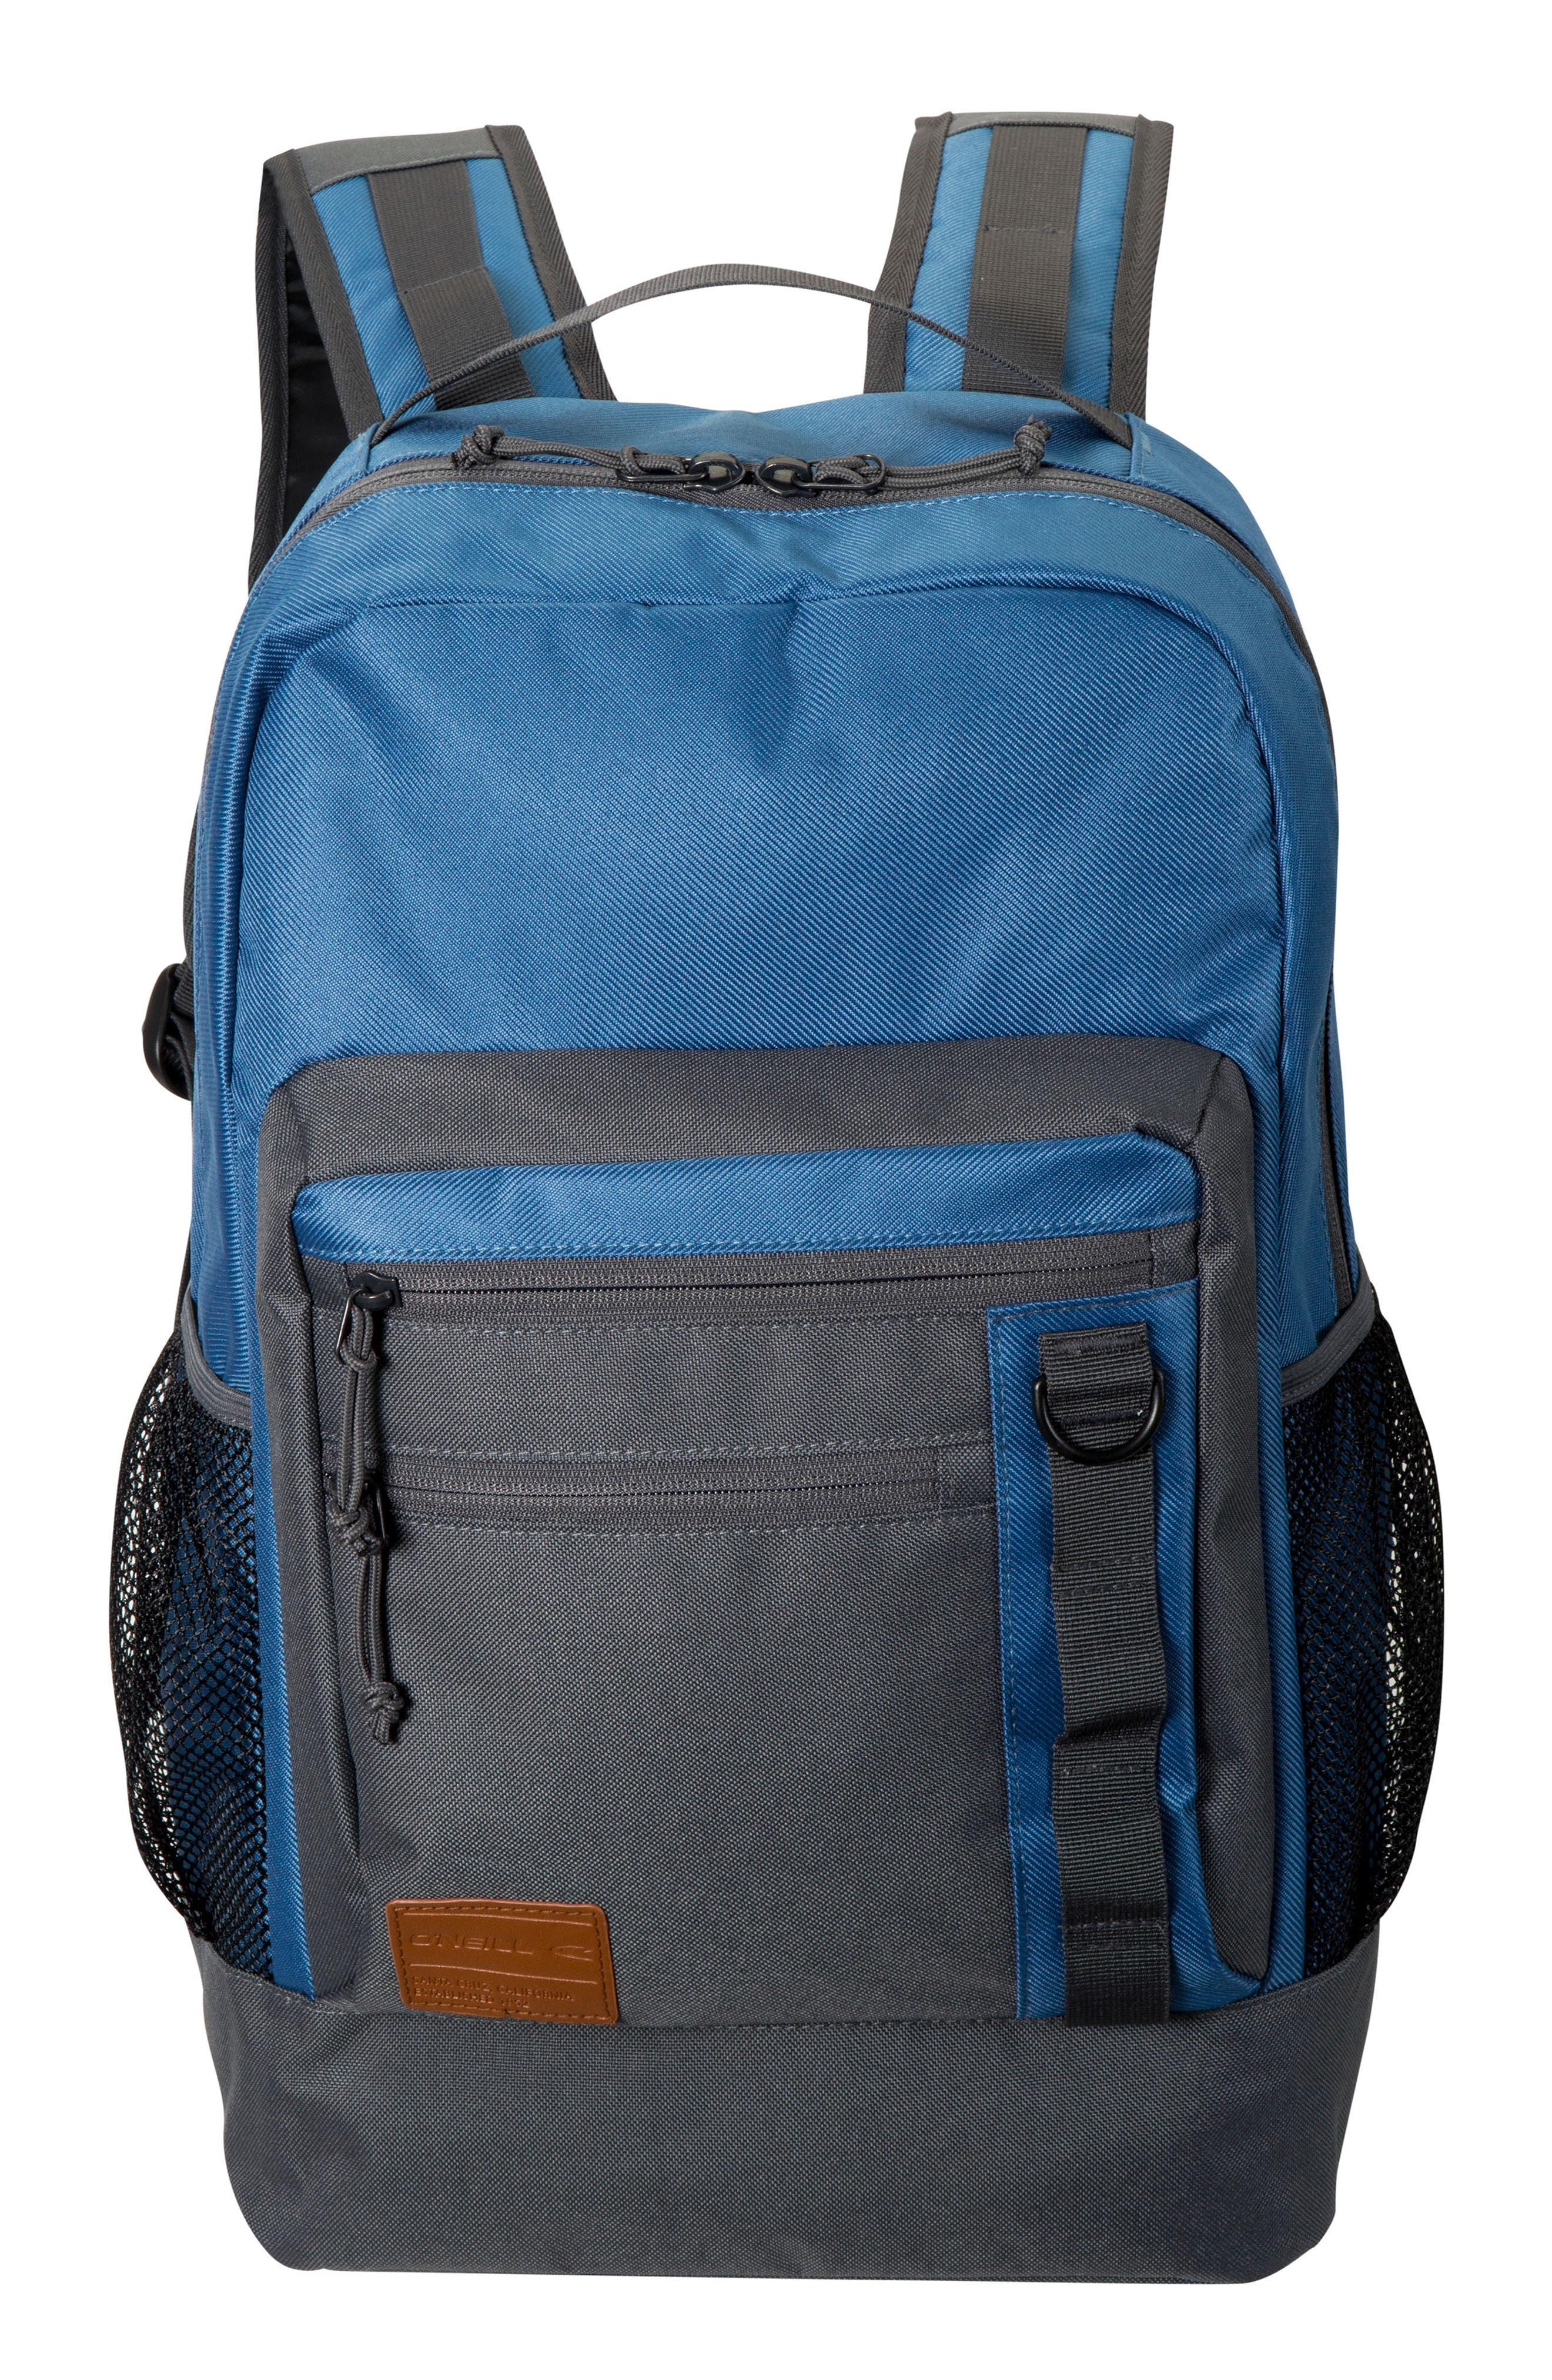 O'Neill Newps Backpack